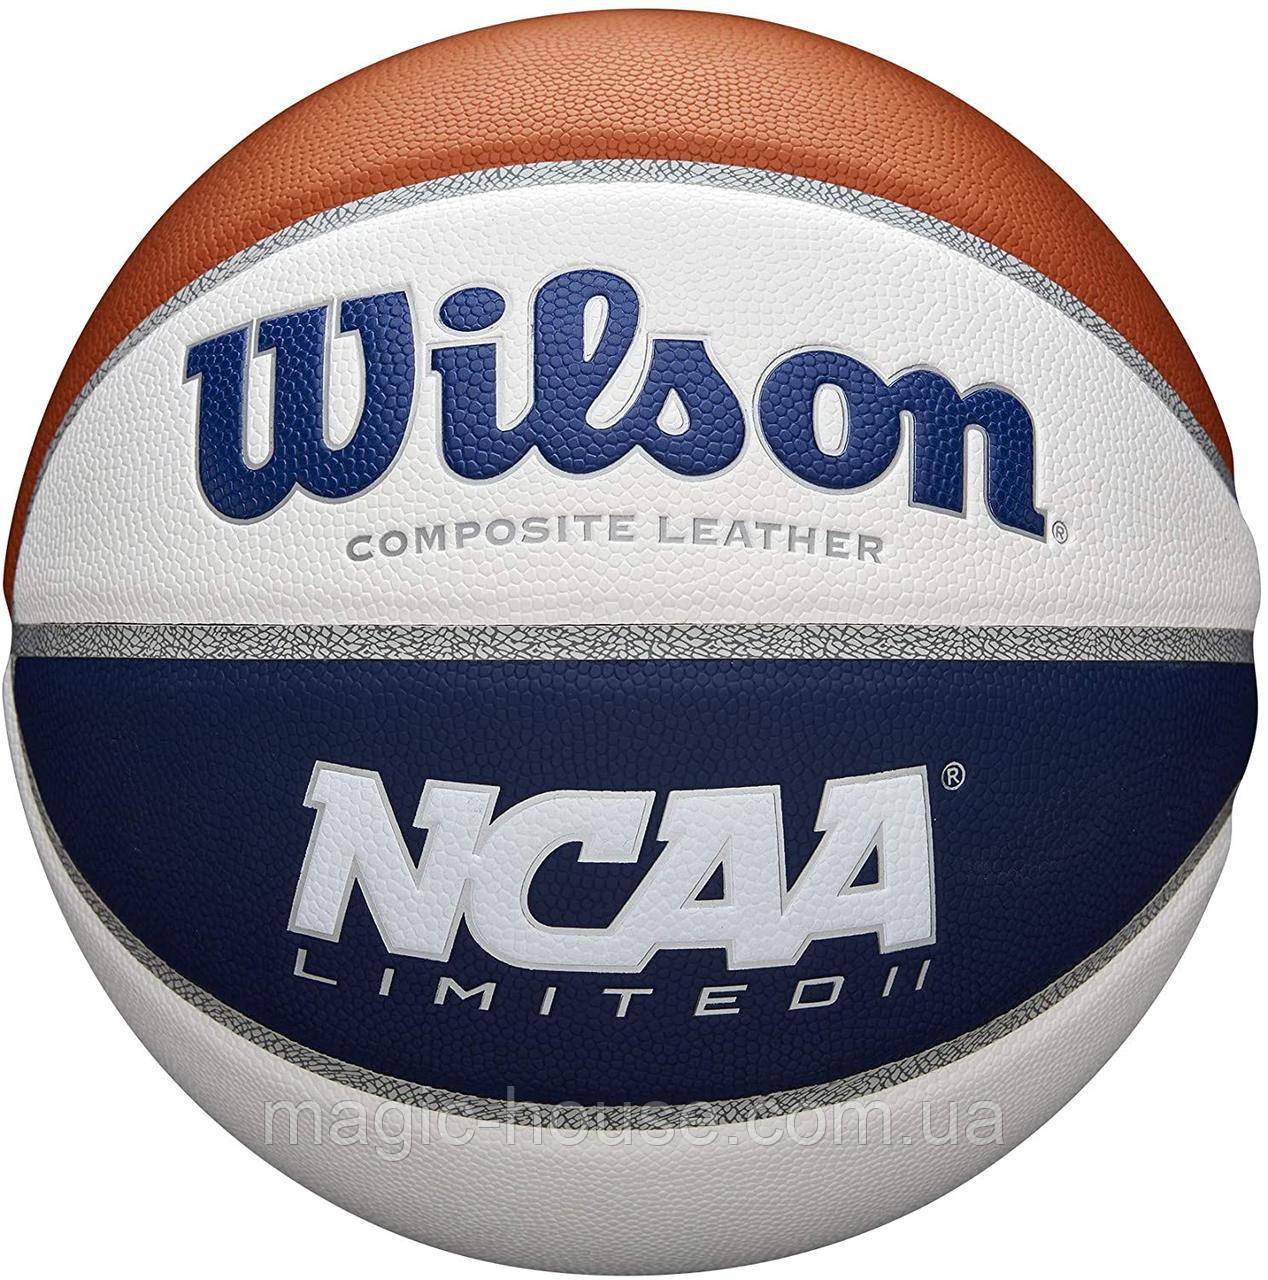 М'яч баскетбольний Wilson NCAA Limited Basketball, Official - 29.5 оригінал розмір 7 композитна шкіра